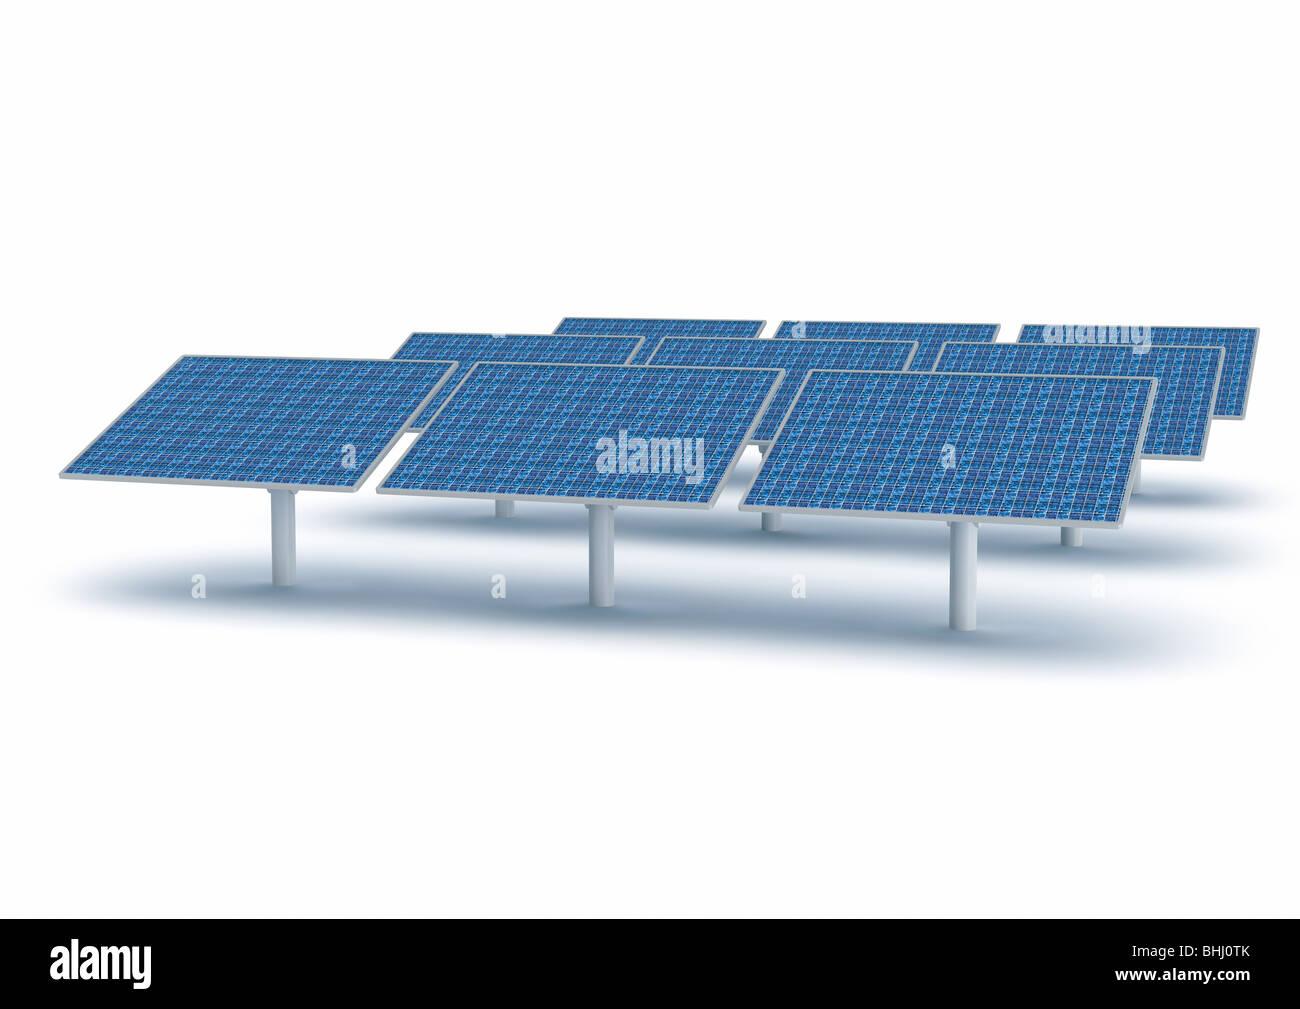 Solar Collector Panel, Energy - Solarpanels Sonnenkollektoren Solarenergie - Stock Image